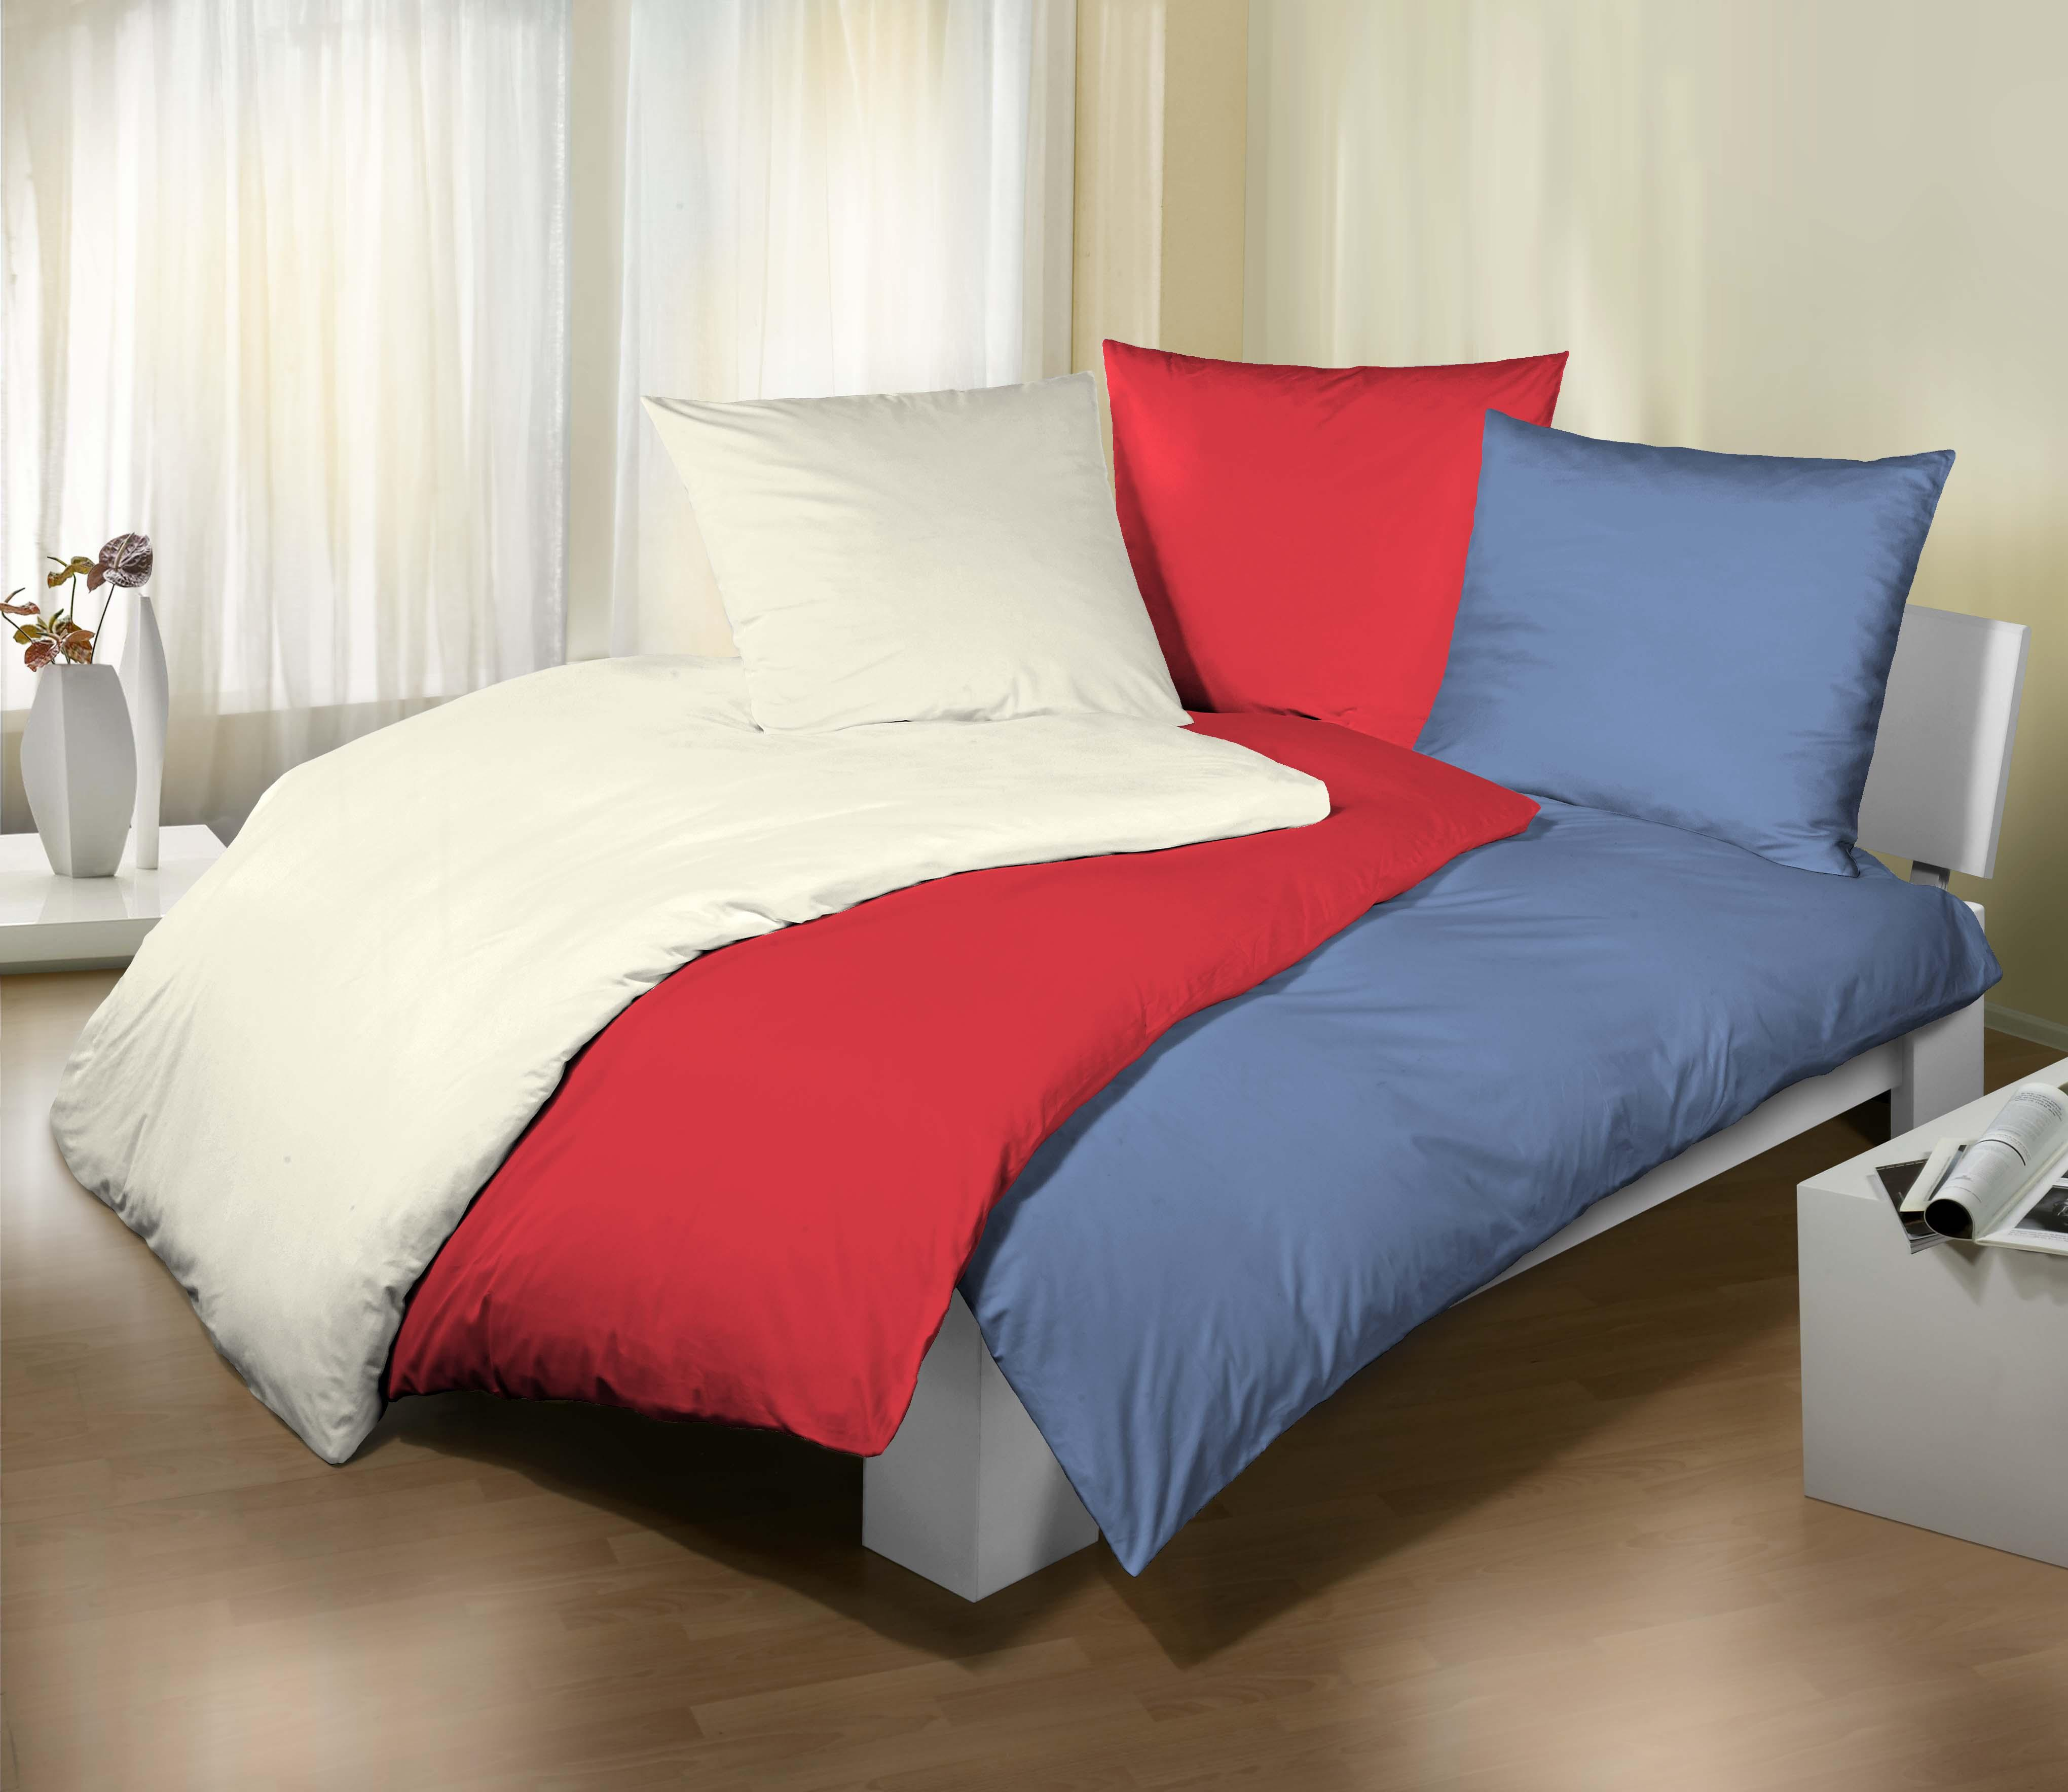 castell 0040500 bettw sche set baumwoll nach ko texstandard 100 80x80 135 200 cm wei. Black Bedroom Furniture Sets. Home Design Ideas